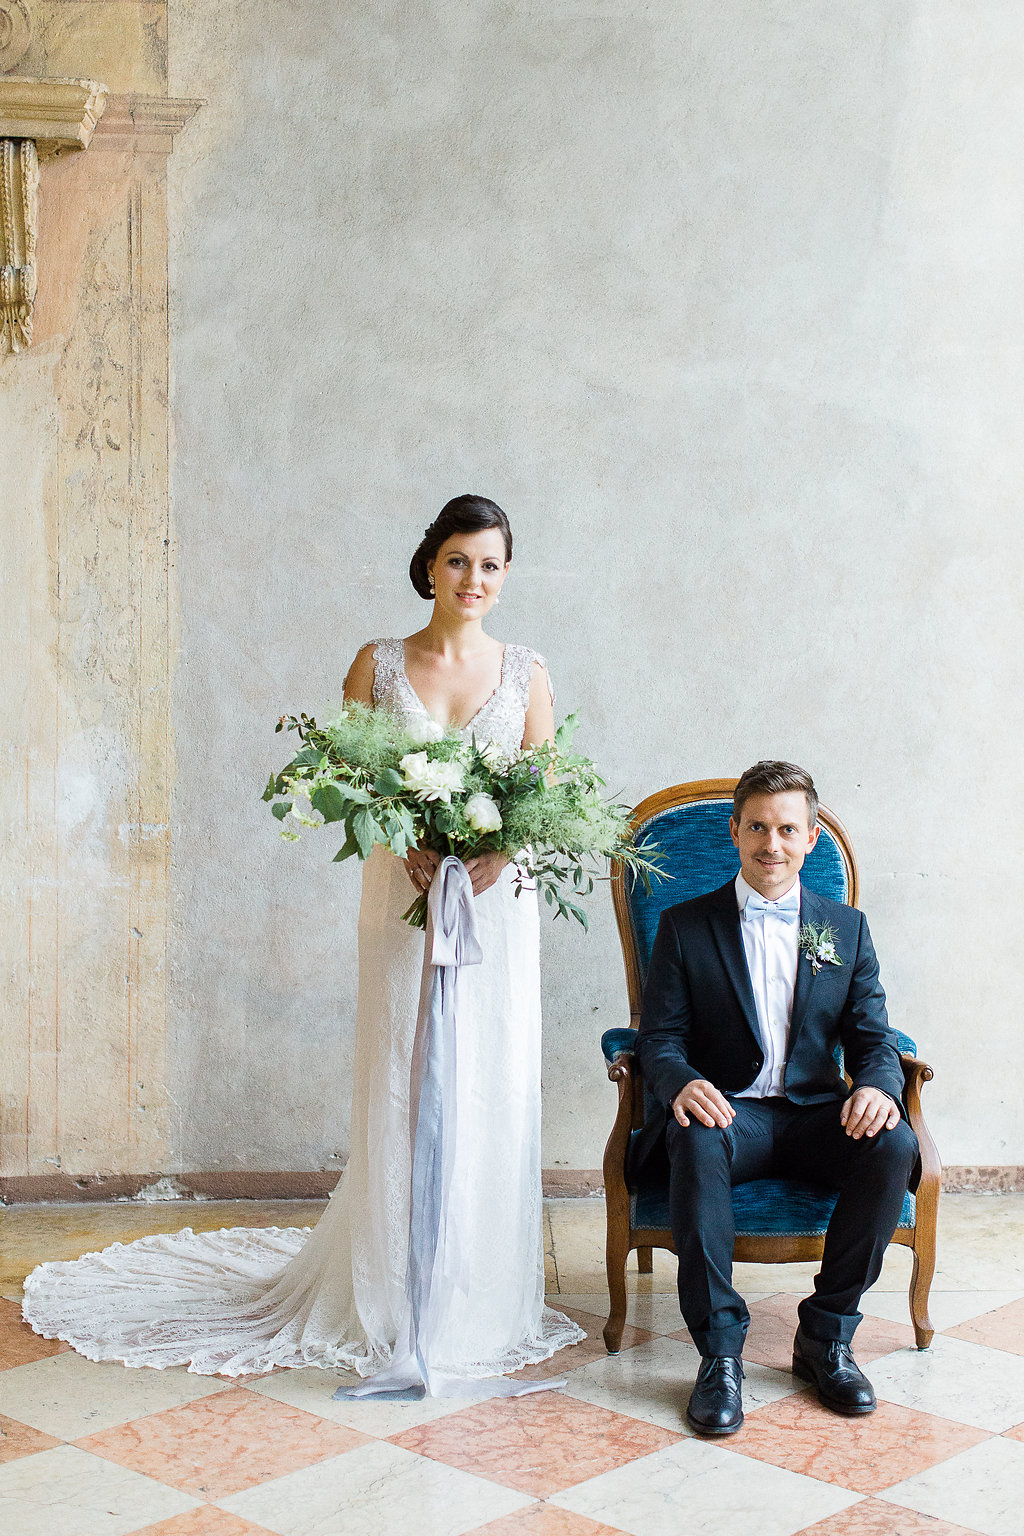 Verona-Destination-Wedding-Inspiration-by-Kibogo-Photography16.jpg